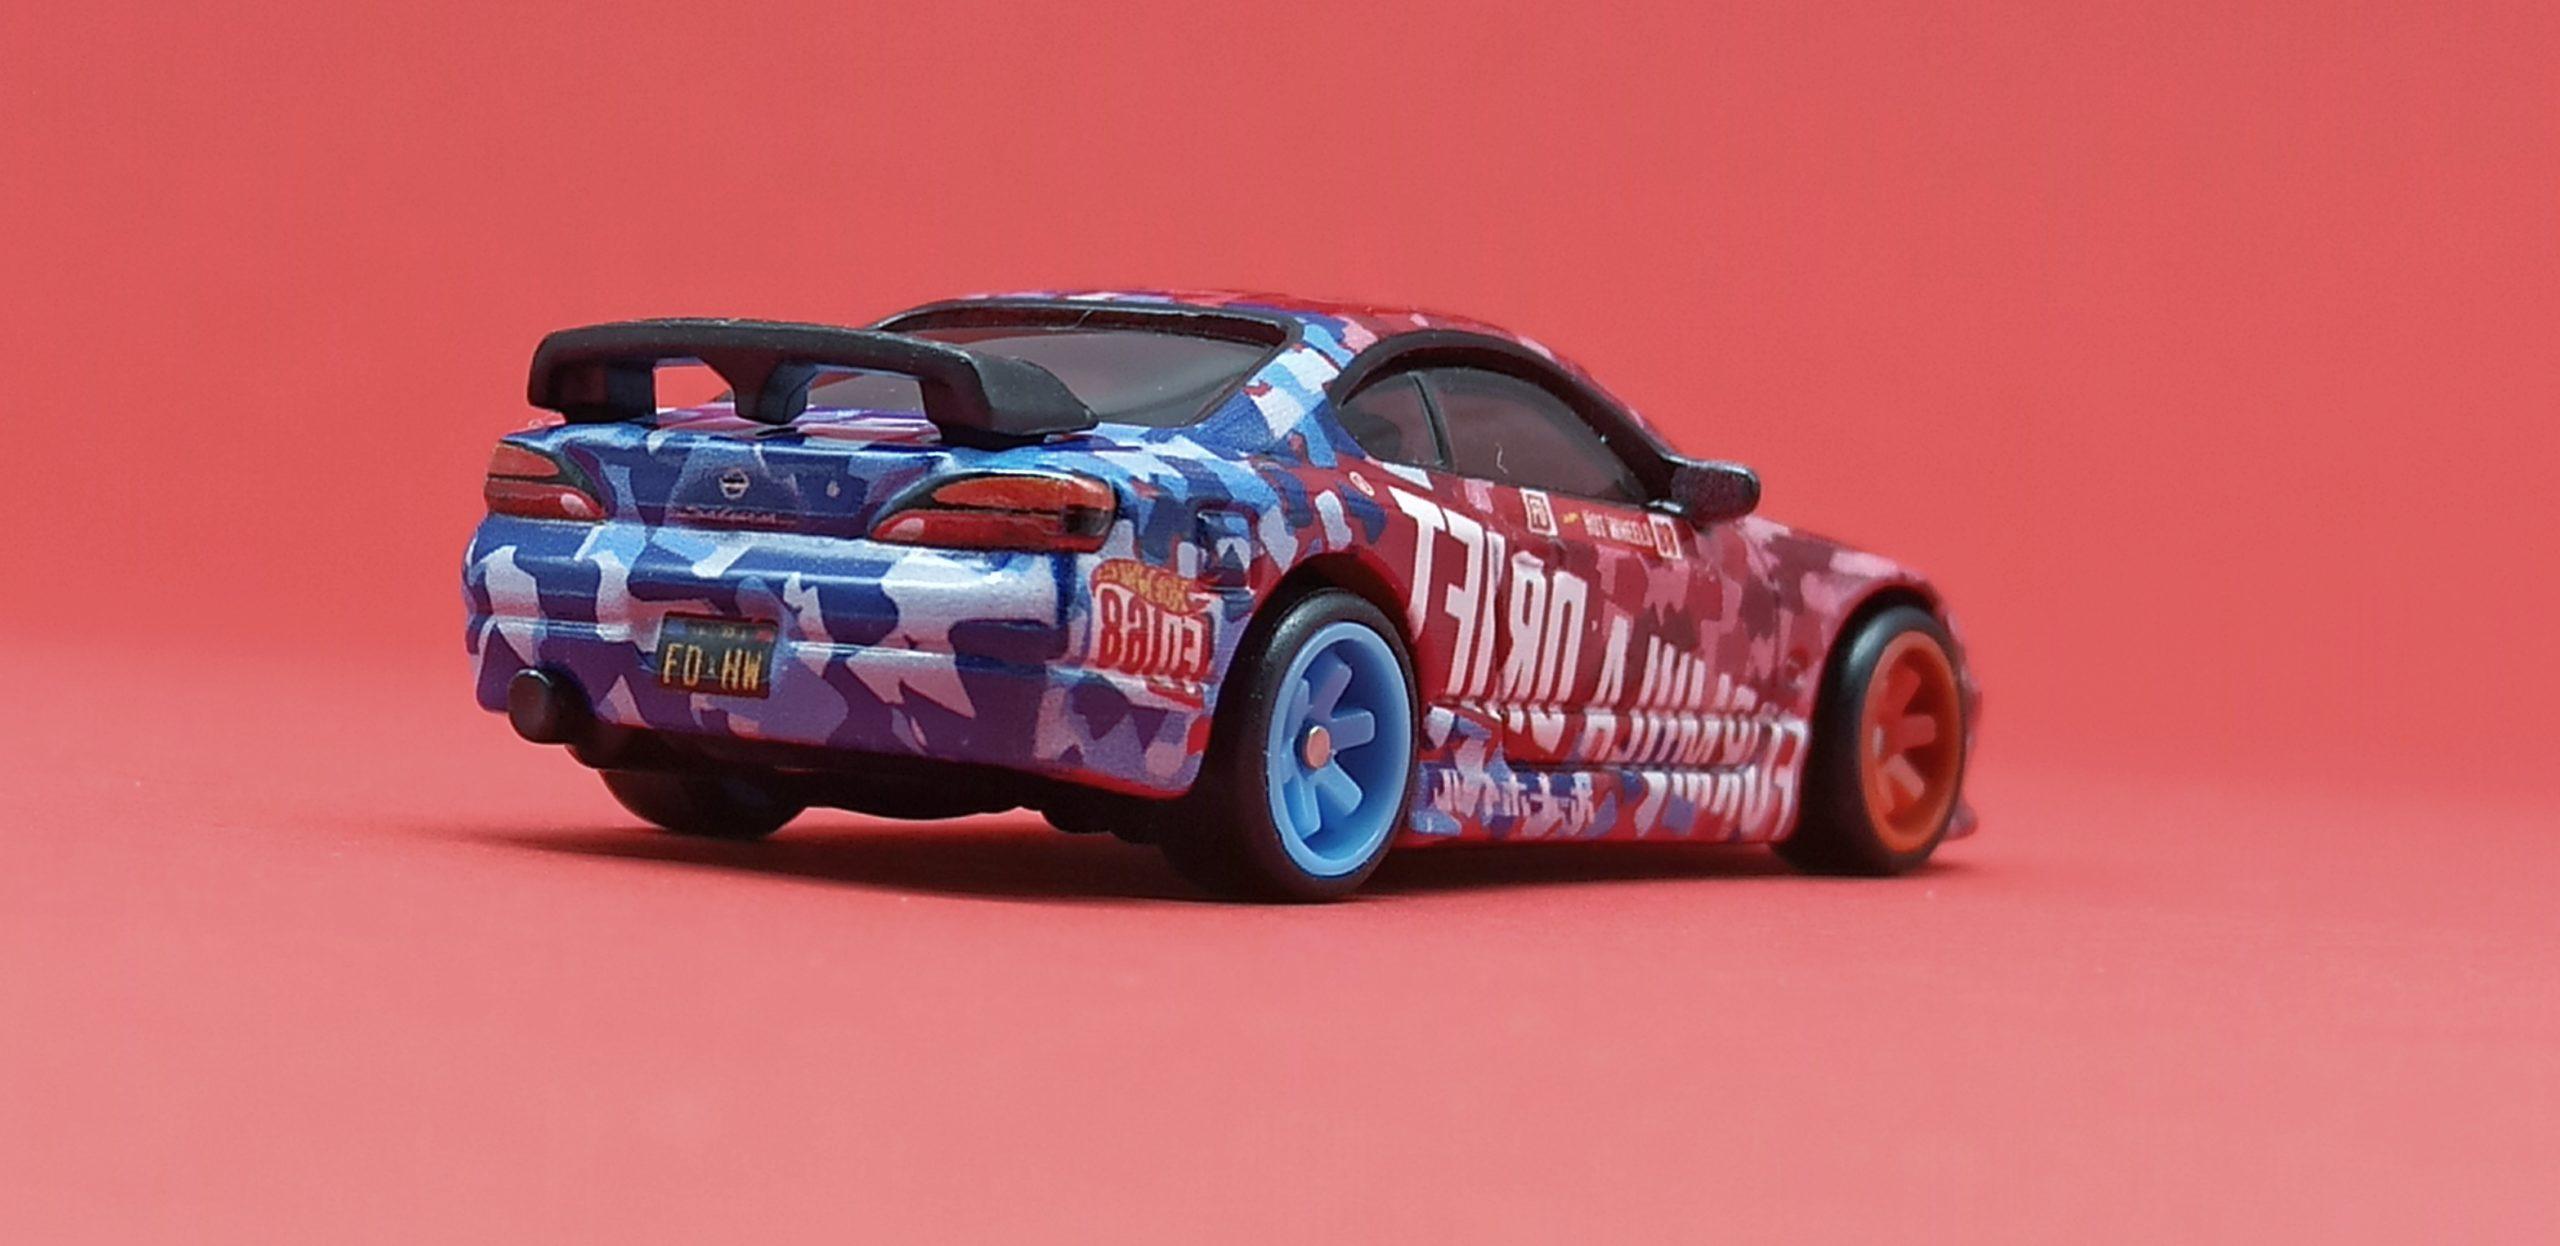 Hot Wheels Nissan Silvia S15 2018 model (GRB46) 2020 Hot Wheels Boulevard #7 Formula Drift red & blue back angle